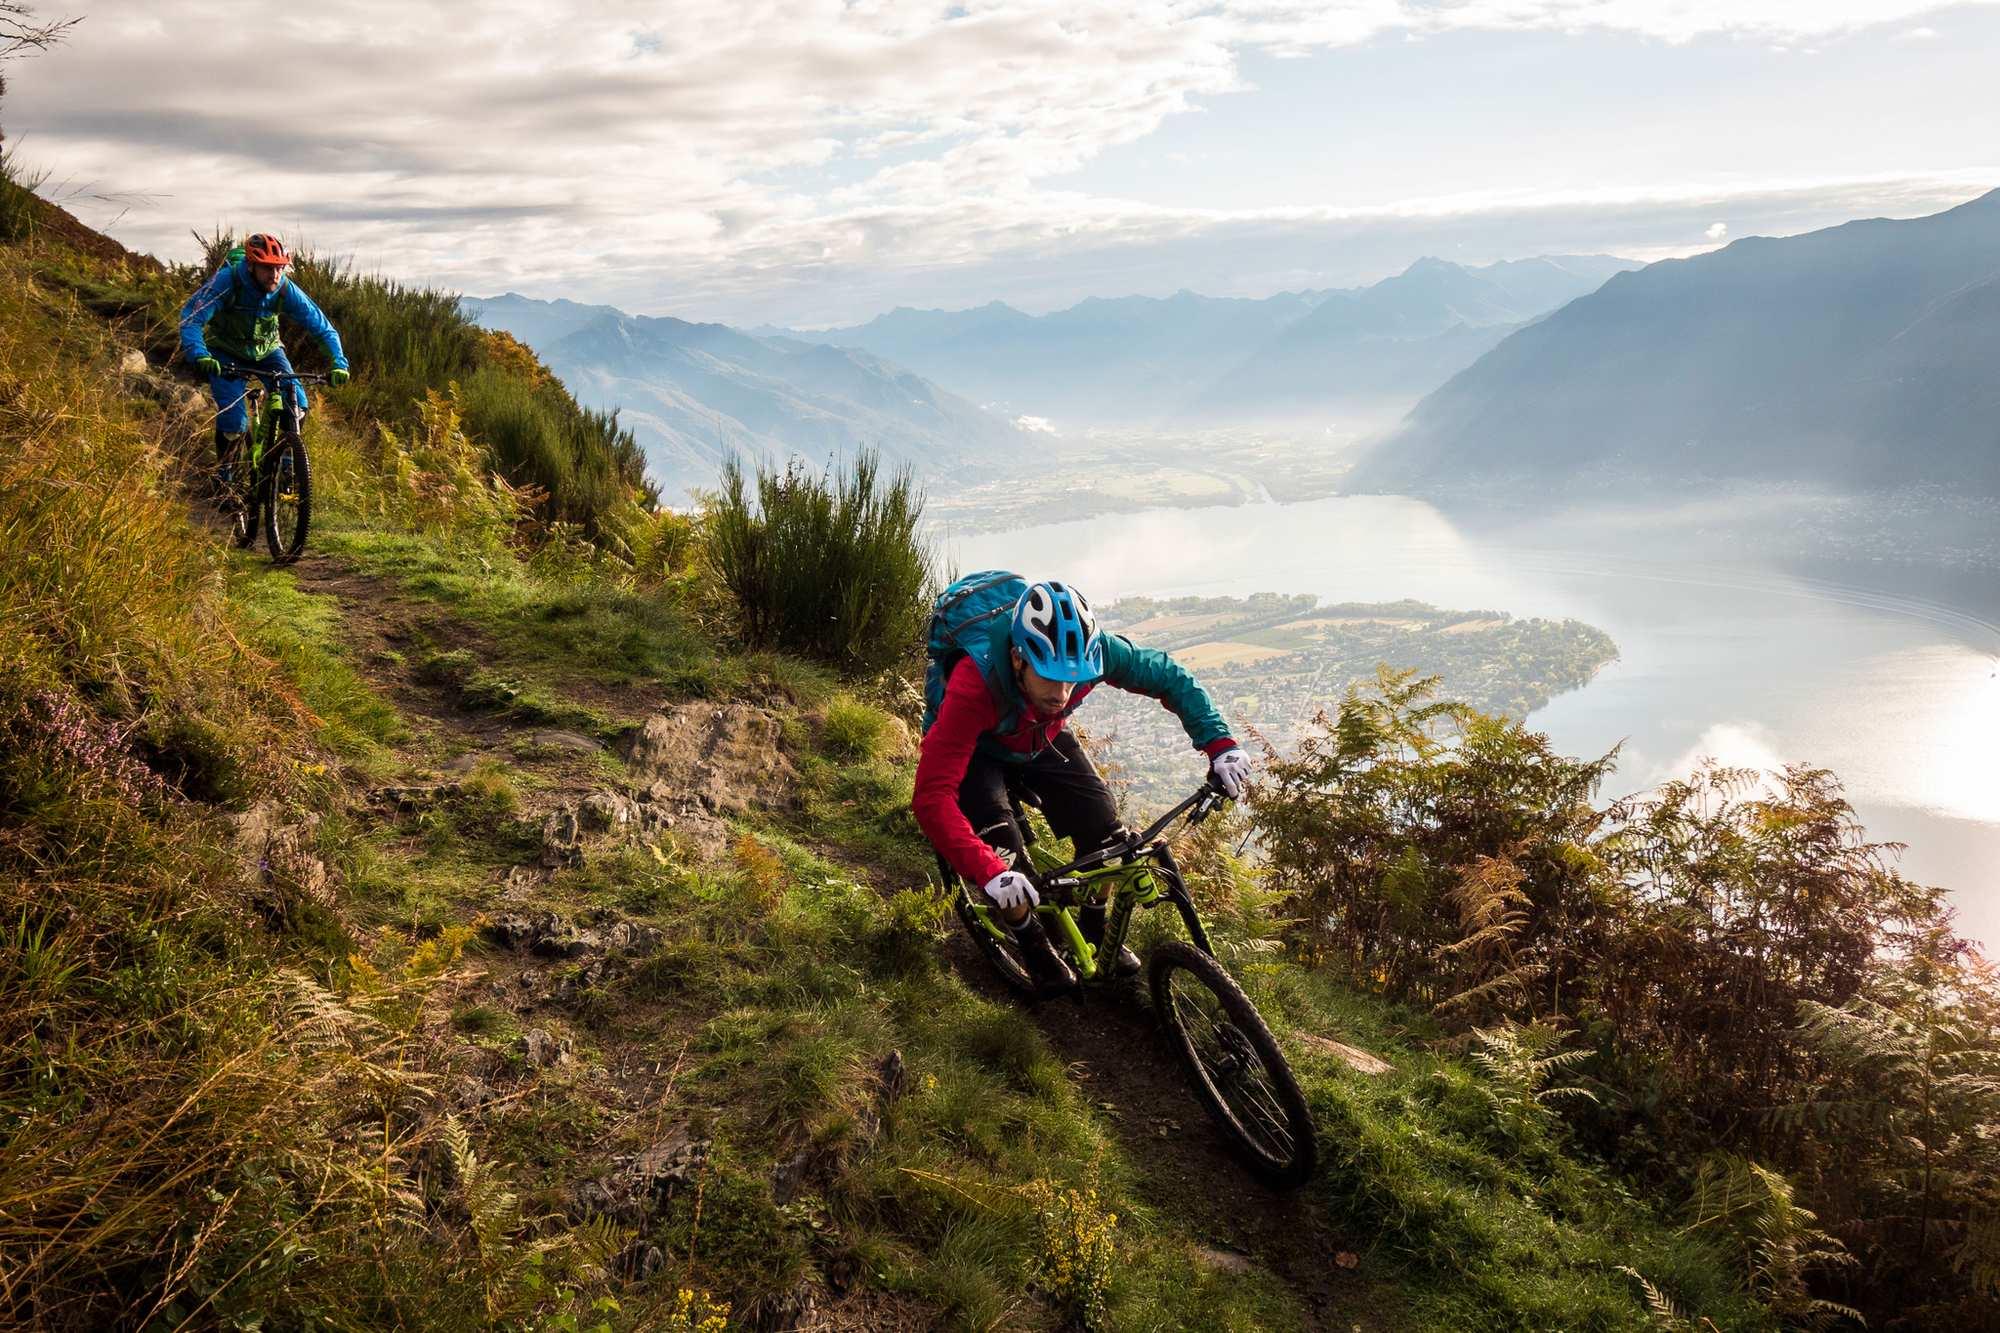 Trails und das süße Leben in Ascona-Locarno